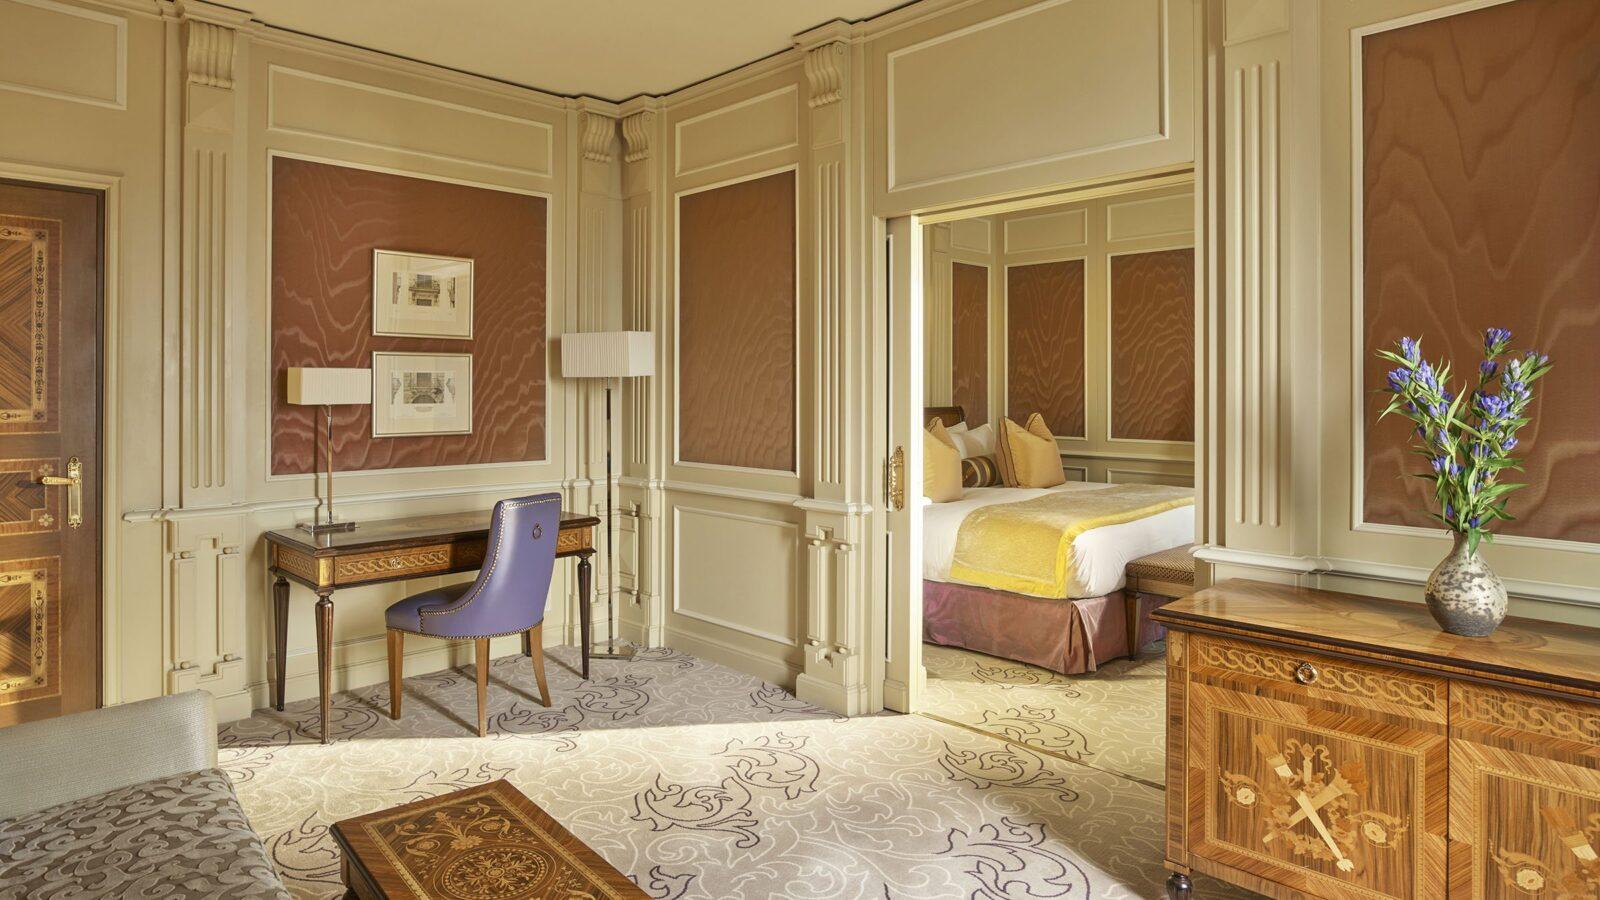 Hotel Principe di Savoia, Ambassador Suite